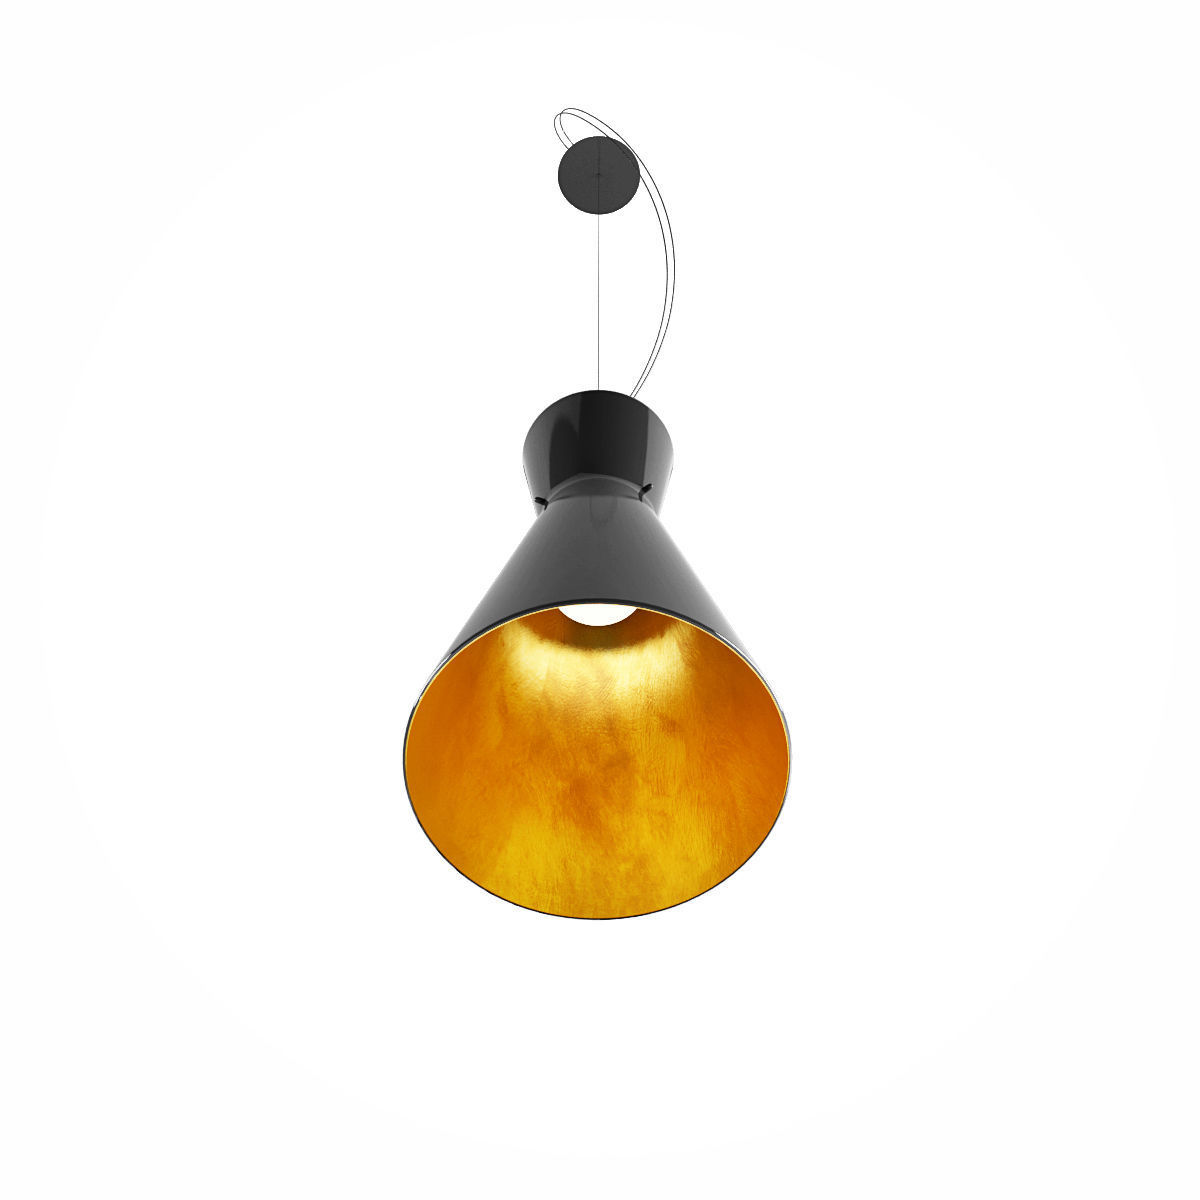 east small home lamp design longmeadow ideas with lane ma lamps unique decoration memory